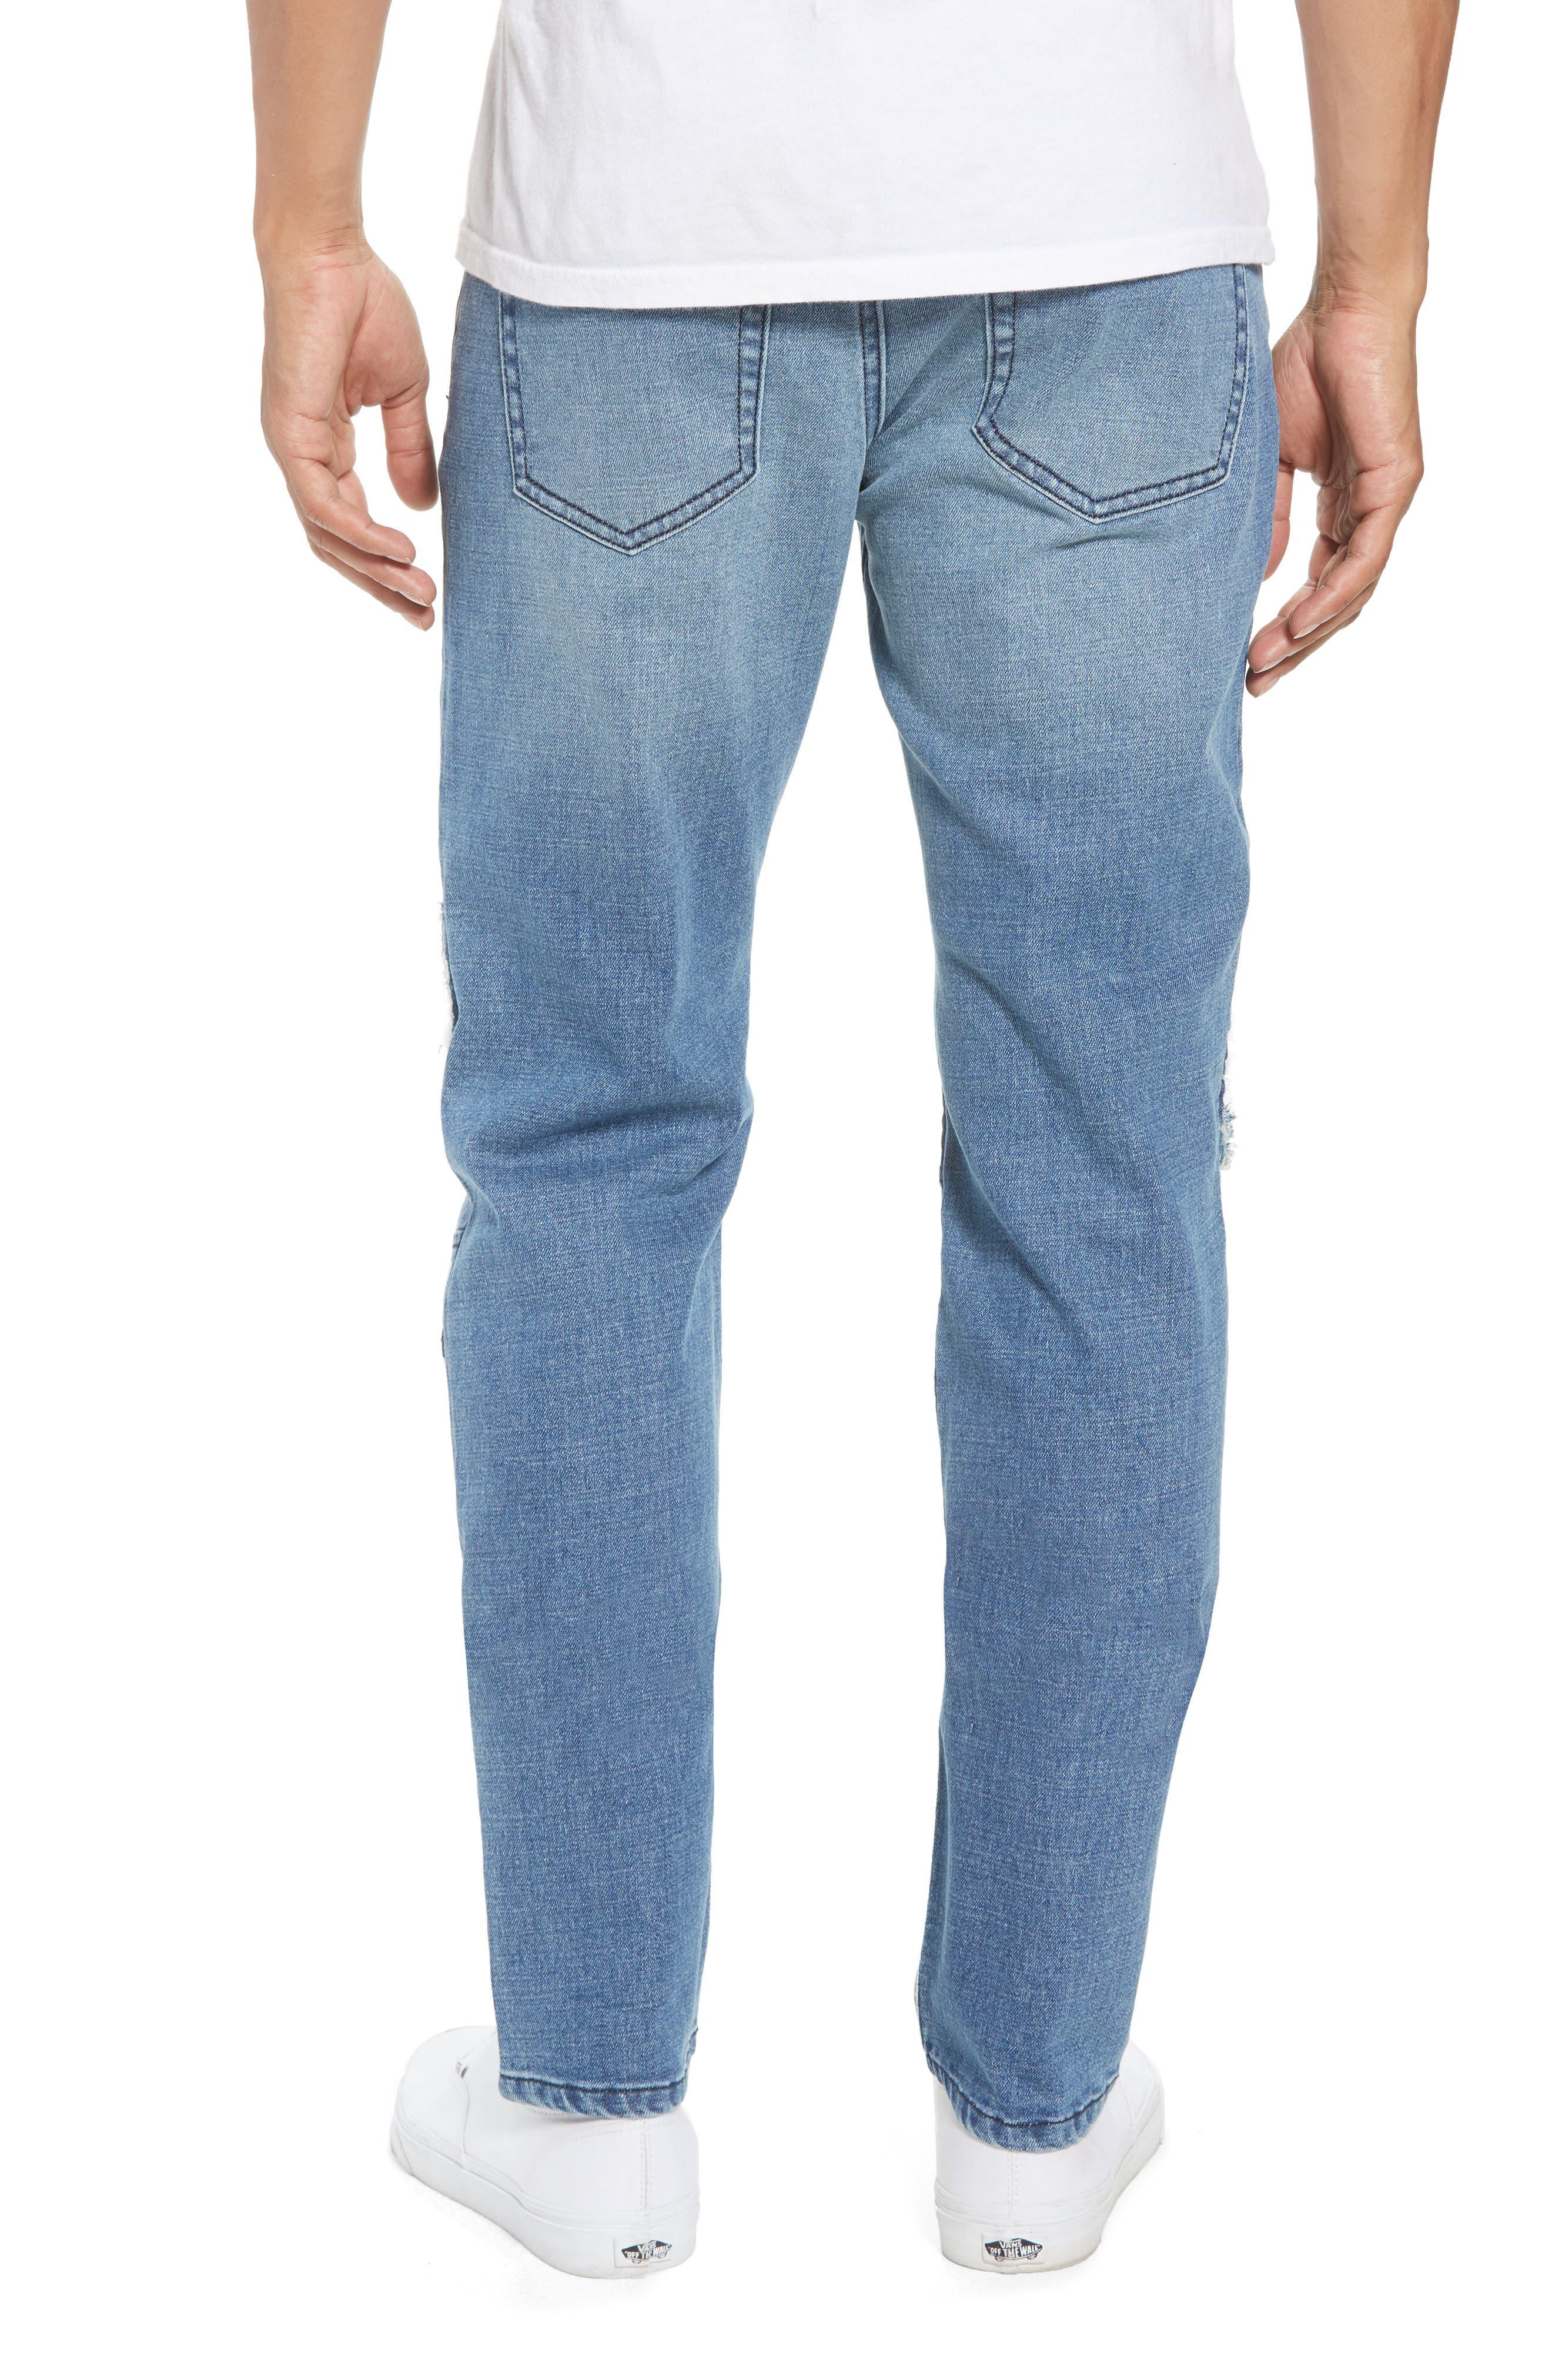 Skinny Moto Jeans,                             Alternate thumbnail 2, color,                             BLUE RIVERS WASH